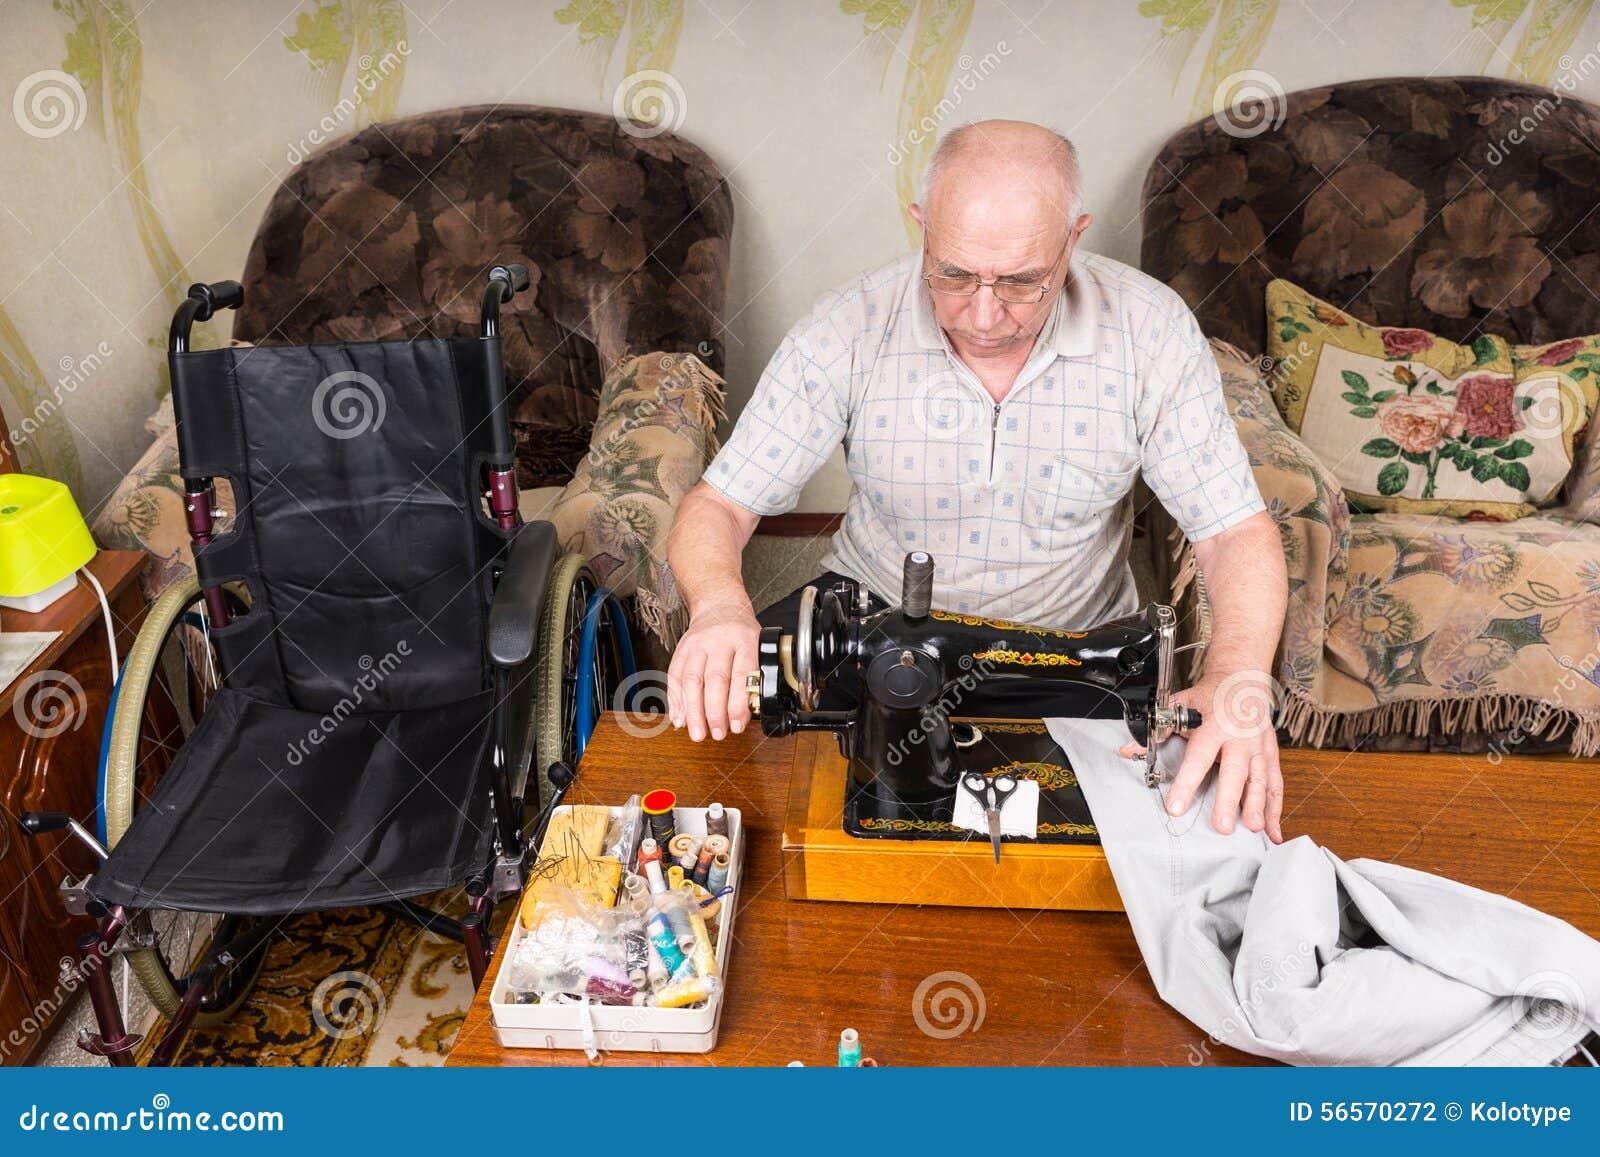 Download Ανώτερο άτομο που χρησιμοποιεί την ντεμοντέ ράβοντας μηχανή Στοκ Εικόνες - εικόνα από armlet, alon: 56570272